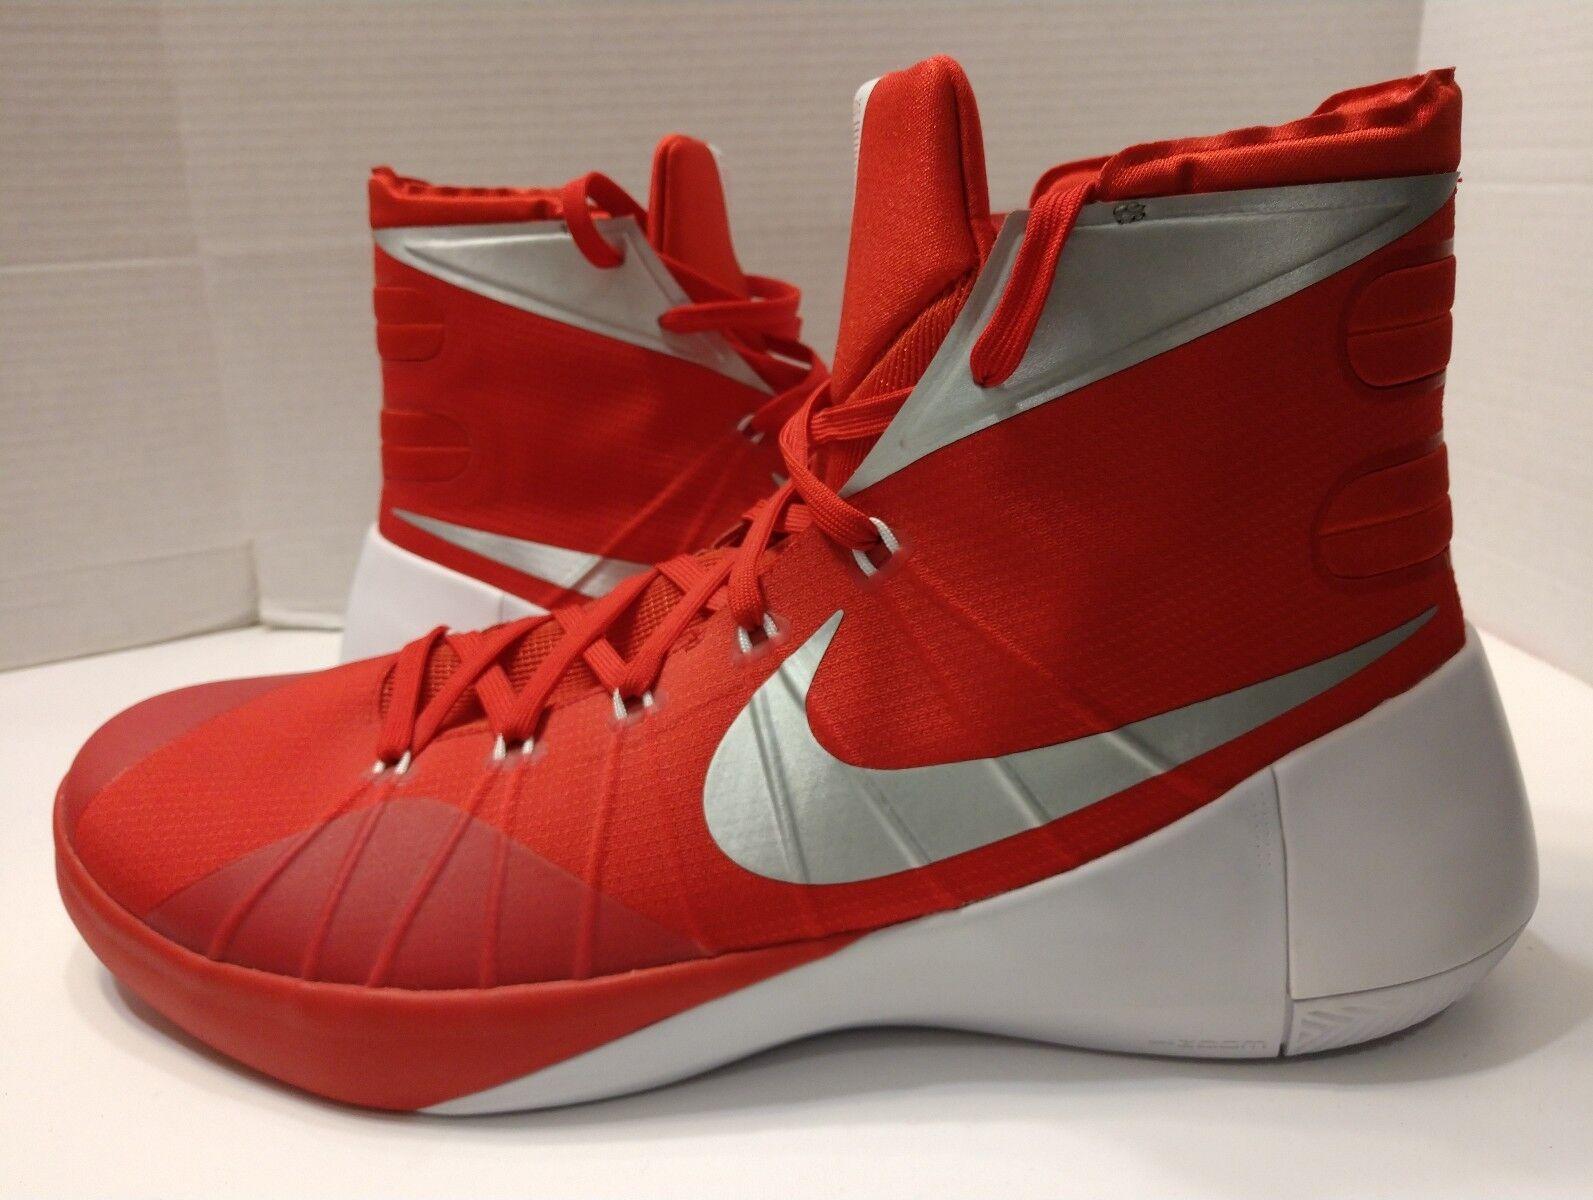 Nike Hyperdunk 2018 Basketball Shoes Red Metallic USA 812944-601 Men's Comfortable